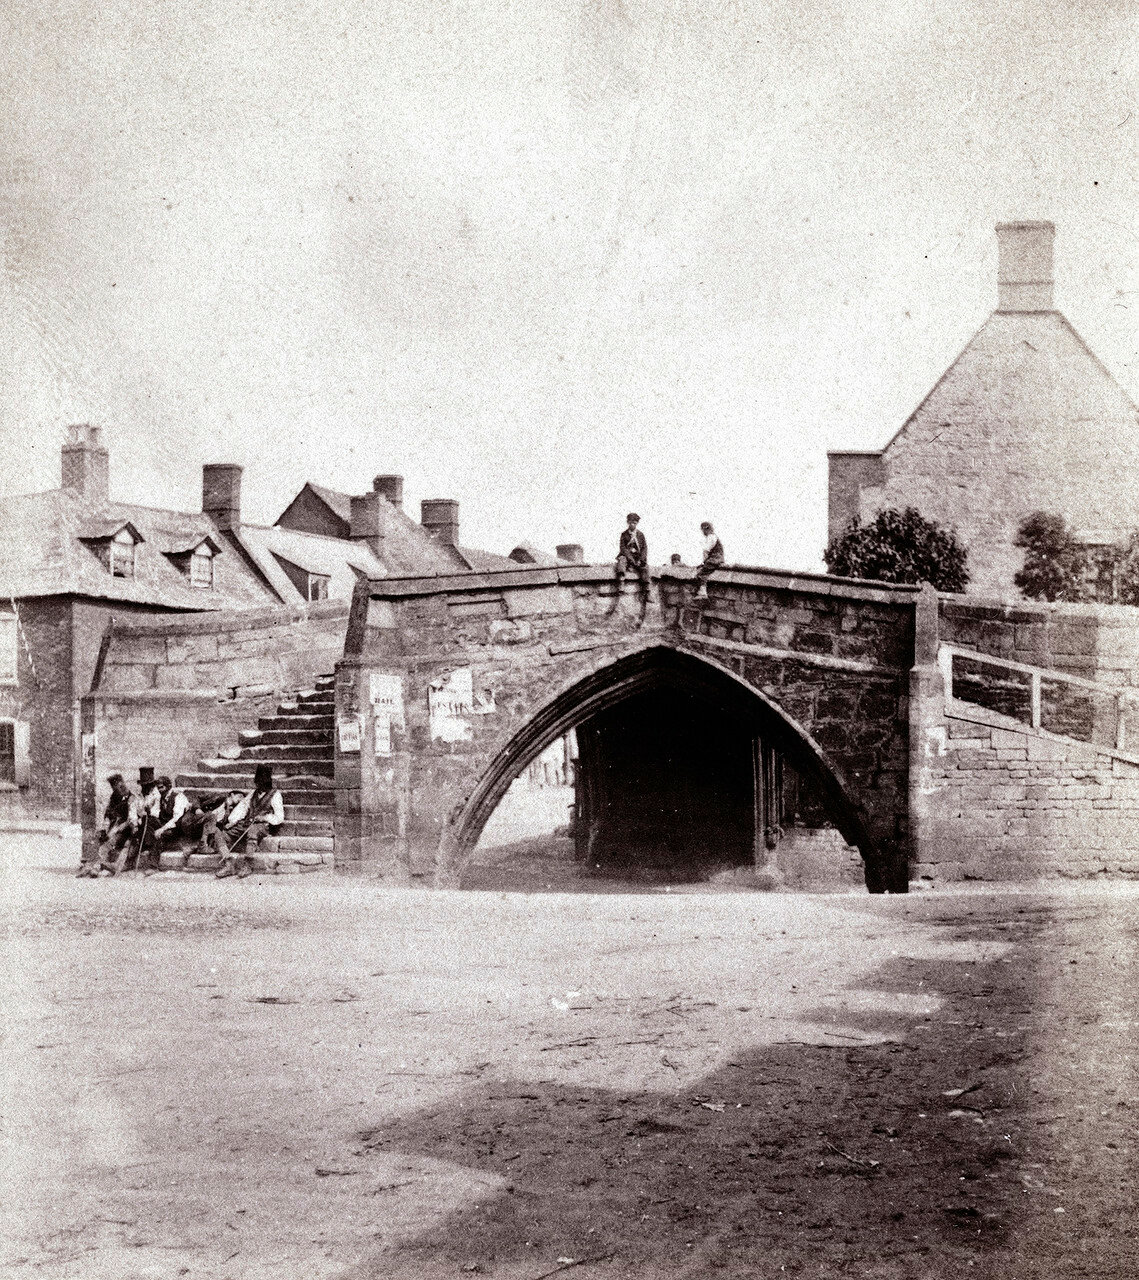 Кроулэнд, трехсторонний мост. Великобритания.1864